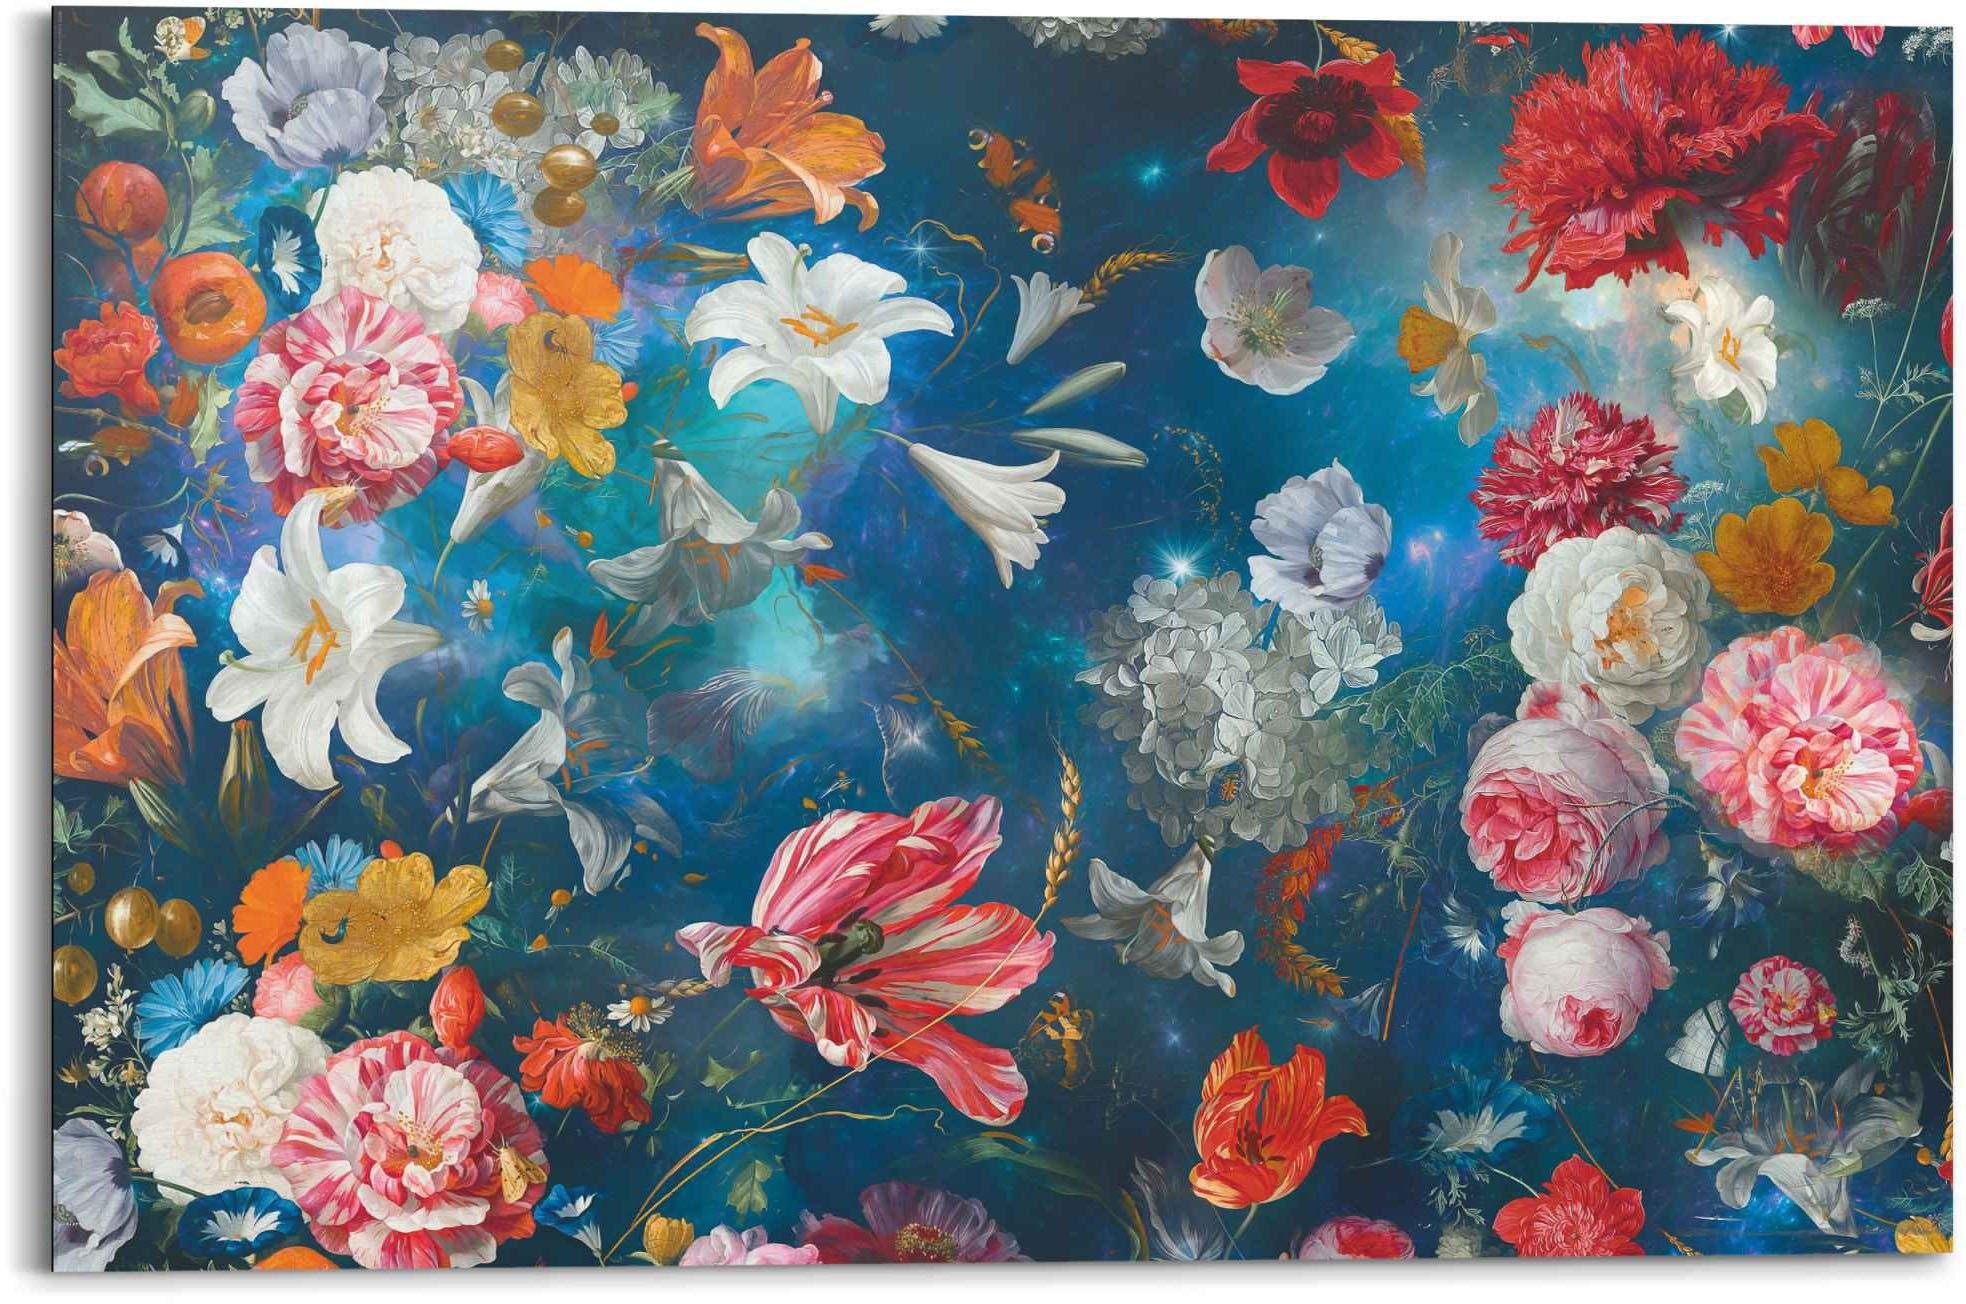 Reinders! artprint Wandbild Blumenwelt Blumen - Pflanzen - Farbenfroh (1 stuk) bestellen: 30 dagen bedenktijd